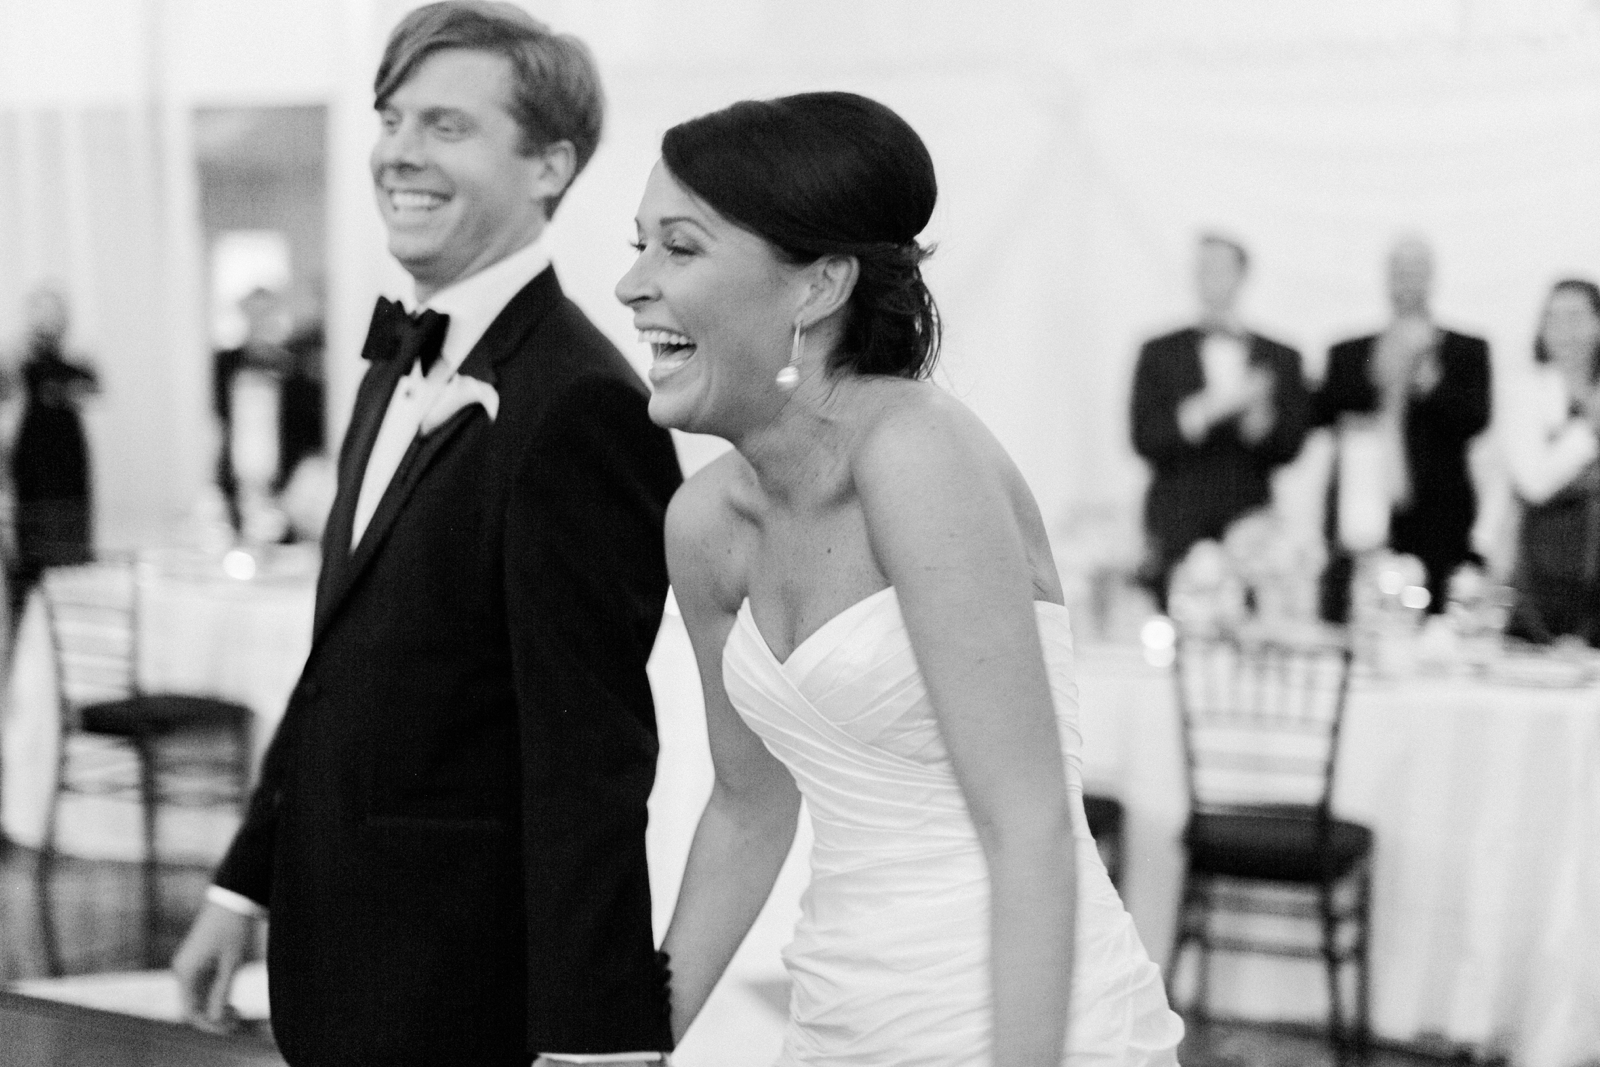 atrium at curtis center wedding photographer philadelphia wedding photographer shannon griffin_0036.jpg